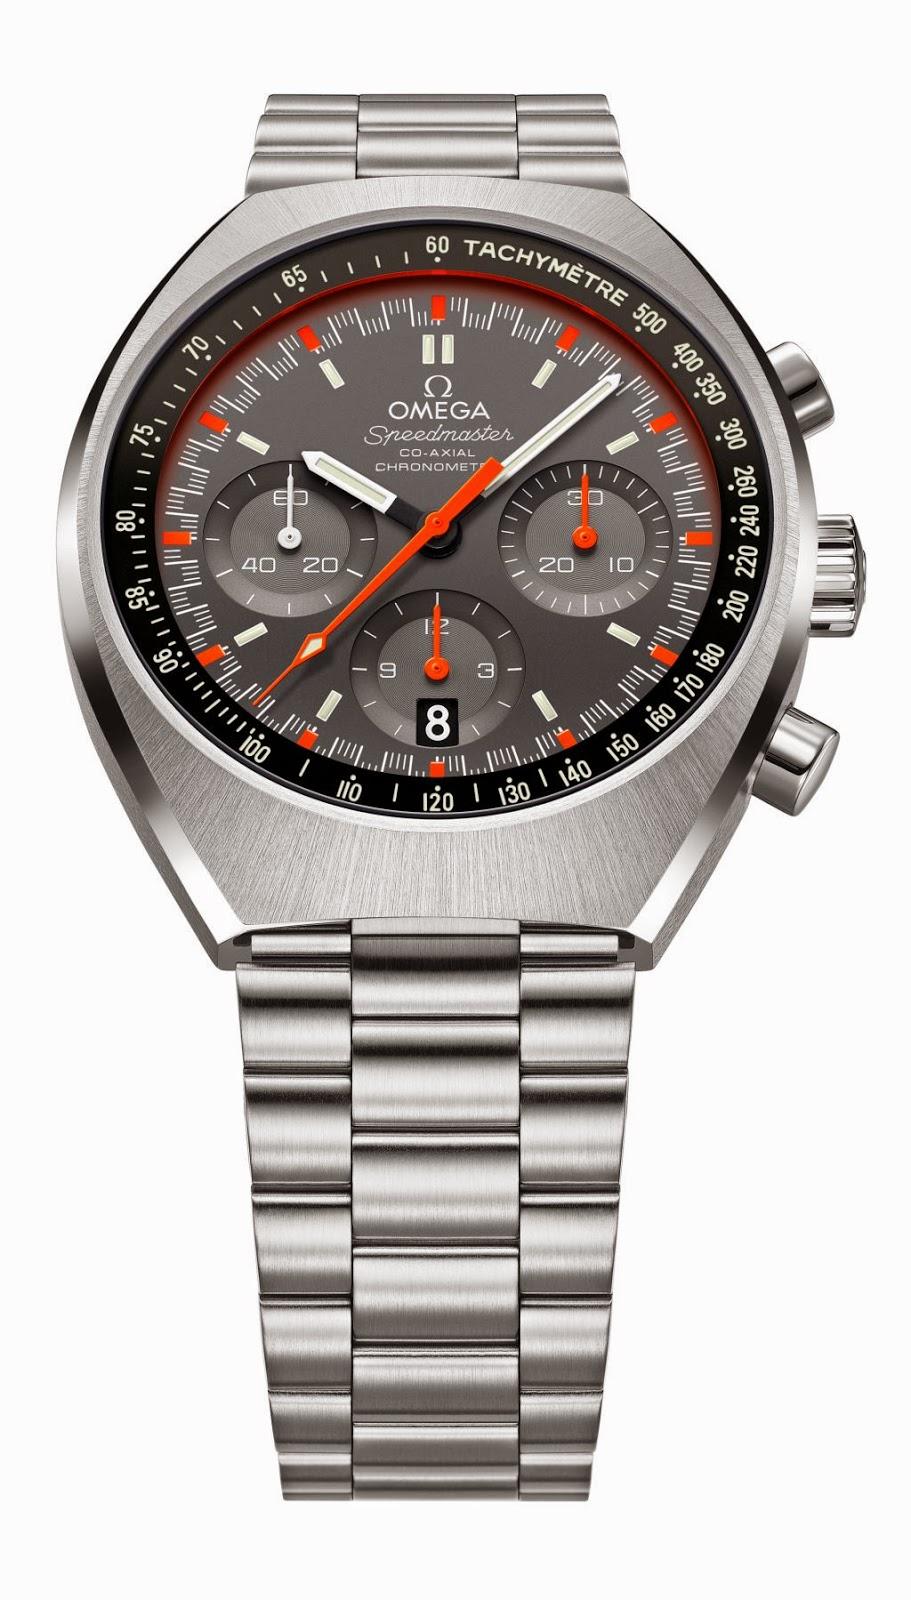 Omega Speedmaster Mark II copy watch